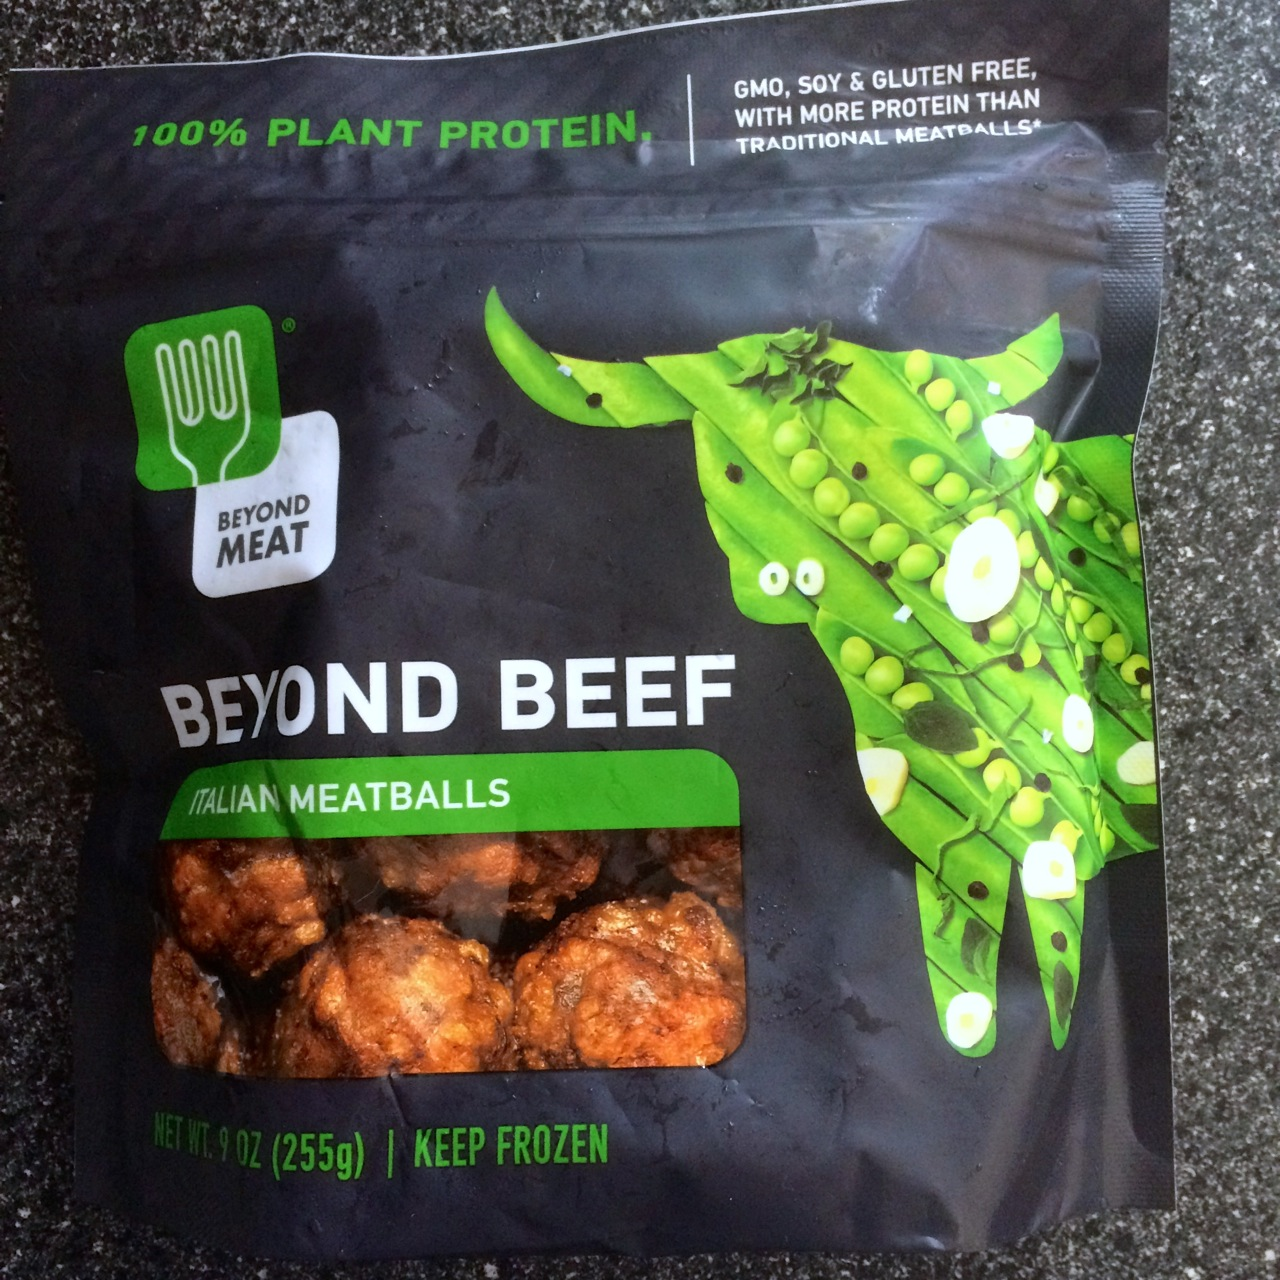 https://i0.wp.com/fatgayvegan.com/wp-content/uploads/2015/06/beyond-meat-italian-meatballs-frozen.jpg?fit=1280%2C1280